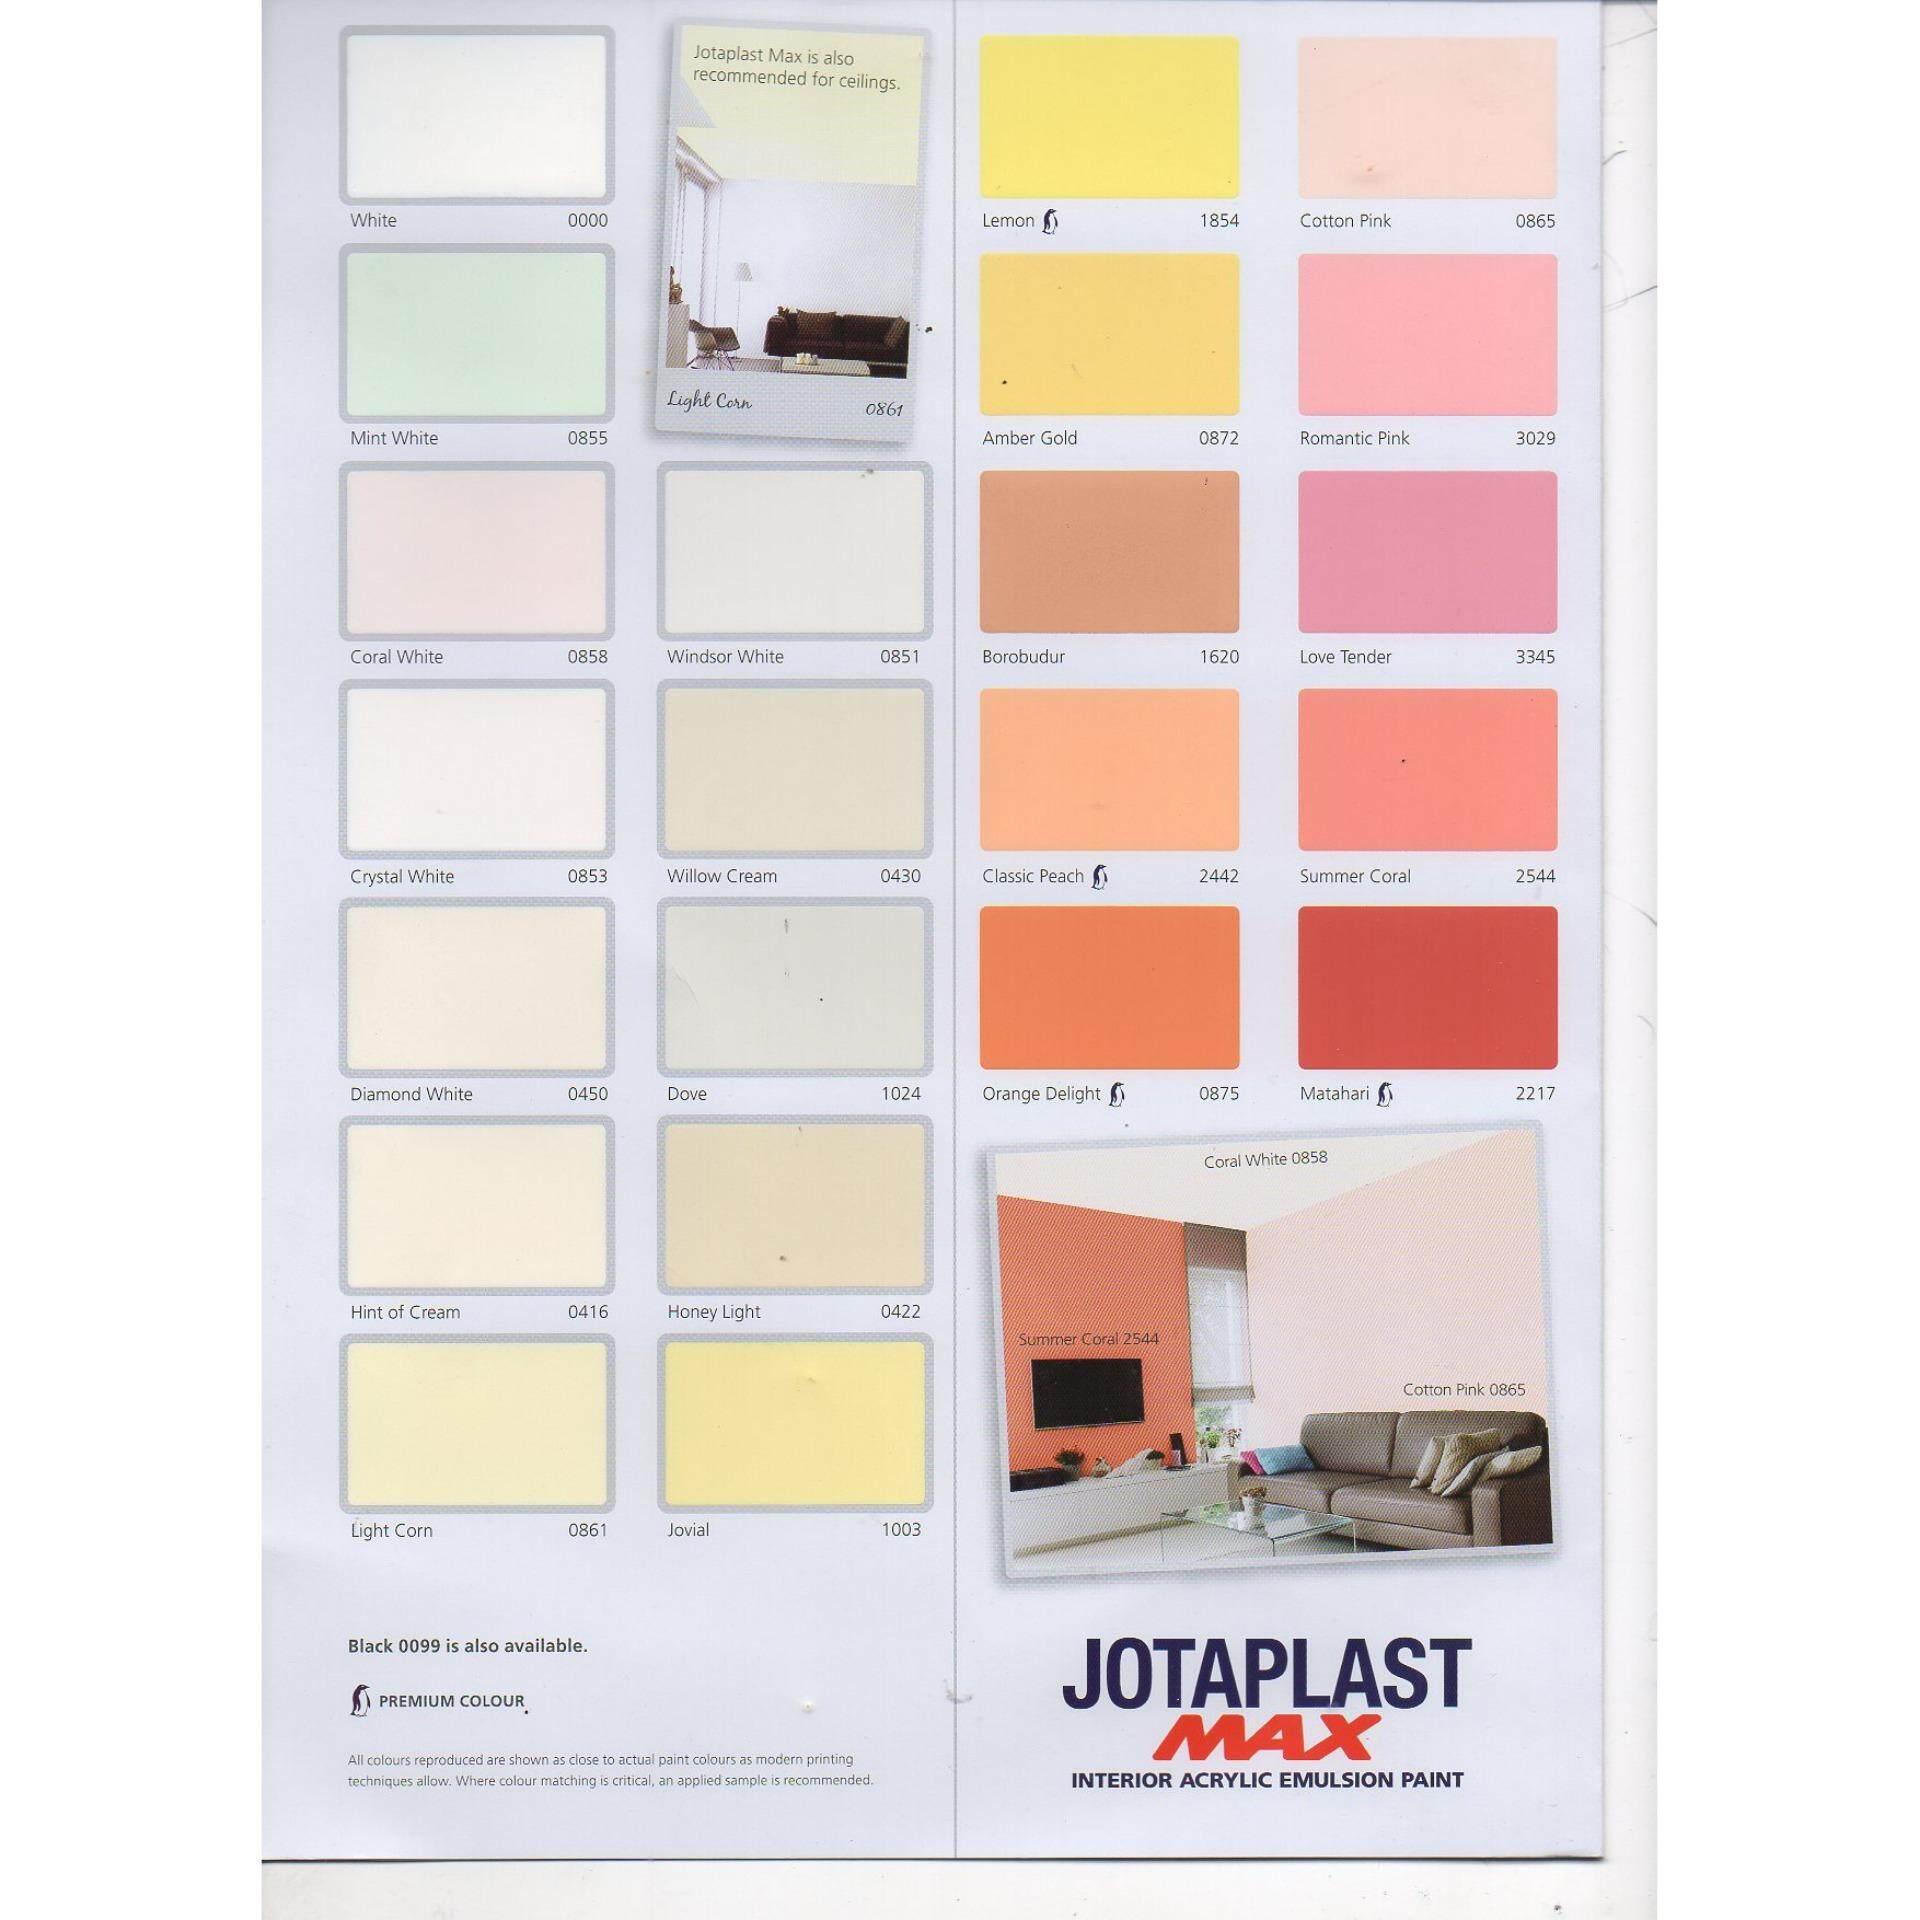 LittleThingy Jotun Jotaplast Max 18L White 000, Interior Acrylic Emulsion  Paint